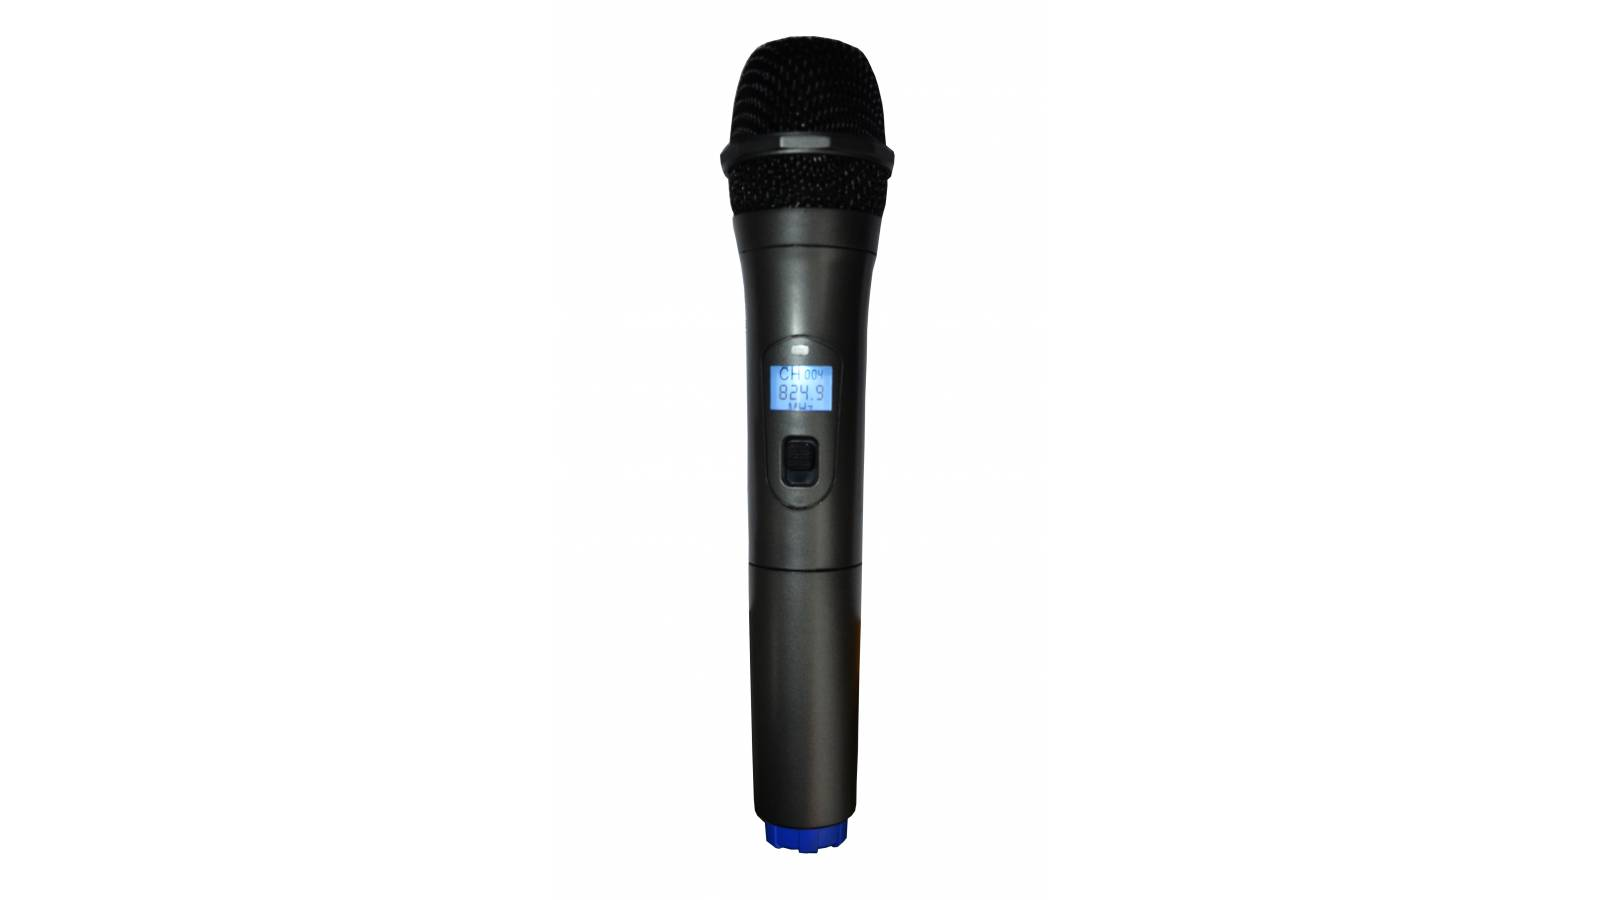 Micrófono Inalámbrico K-UHF02 para Karaoke Alta Calidad